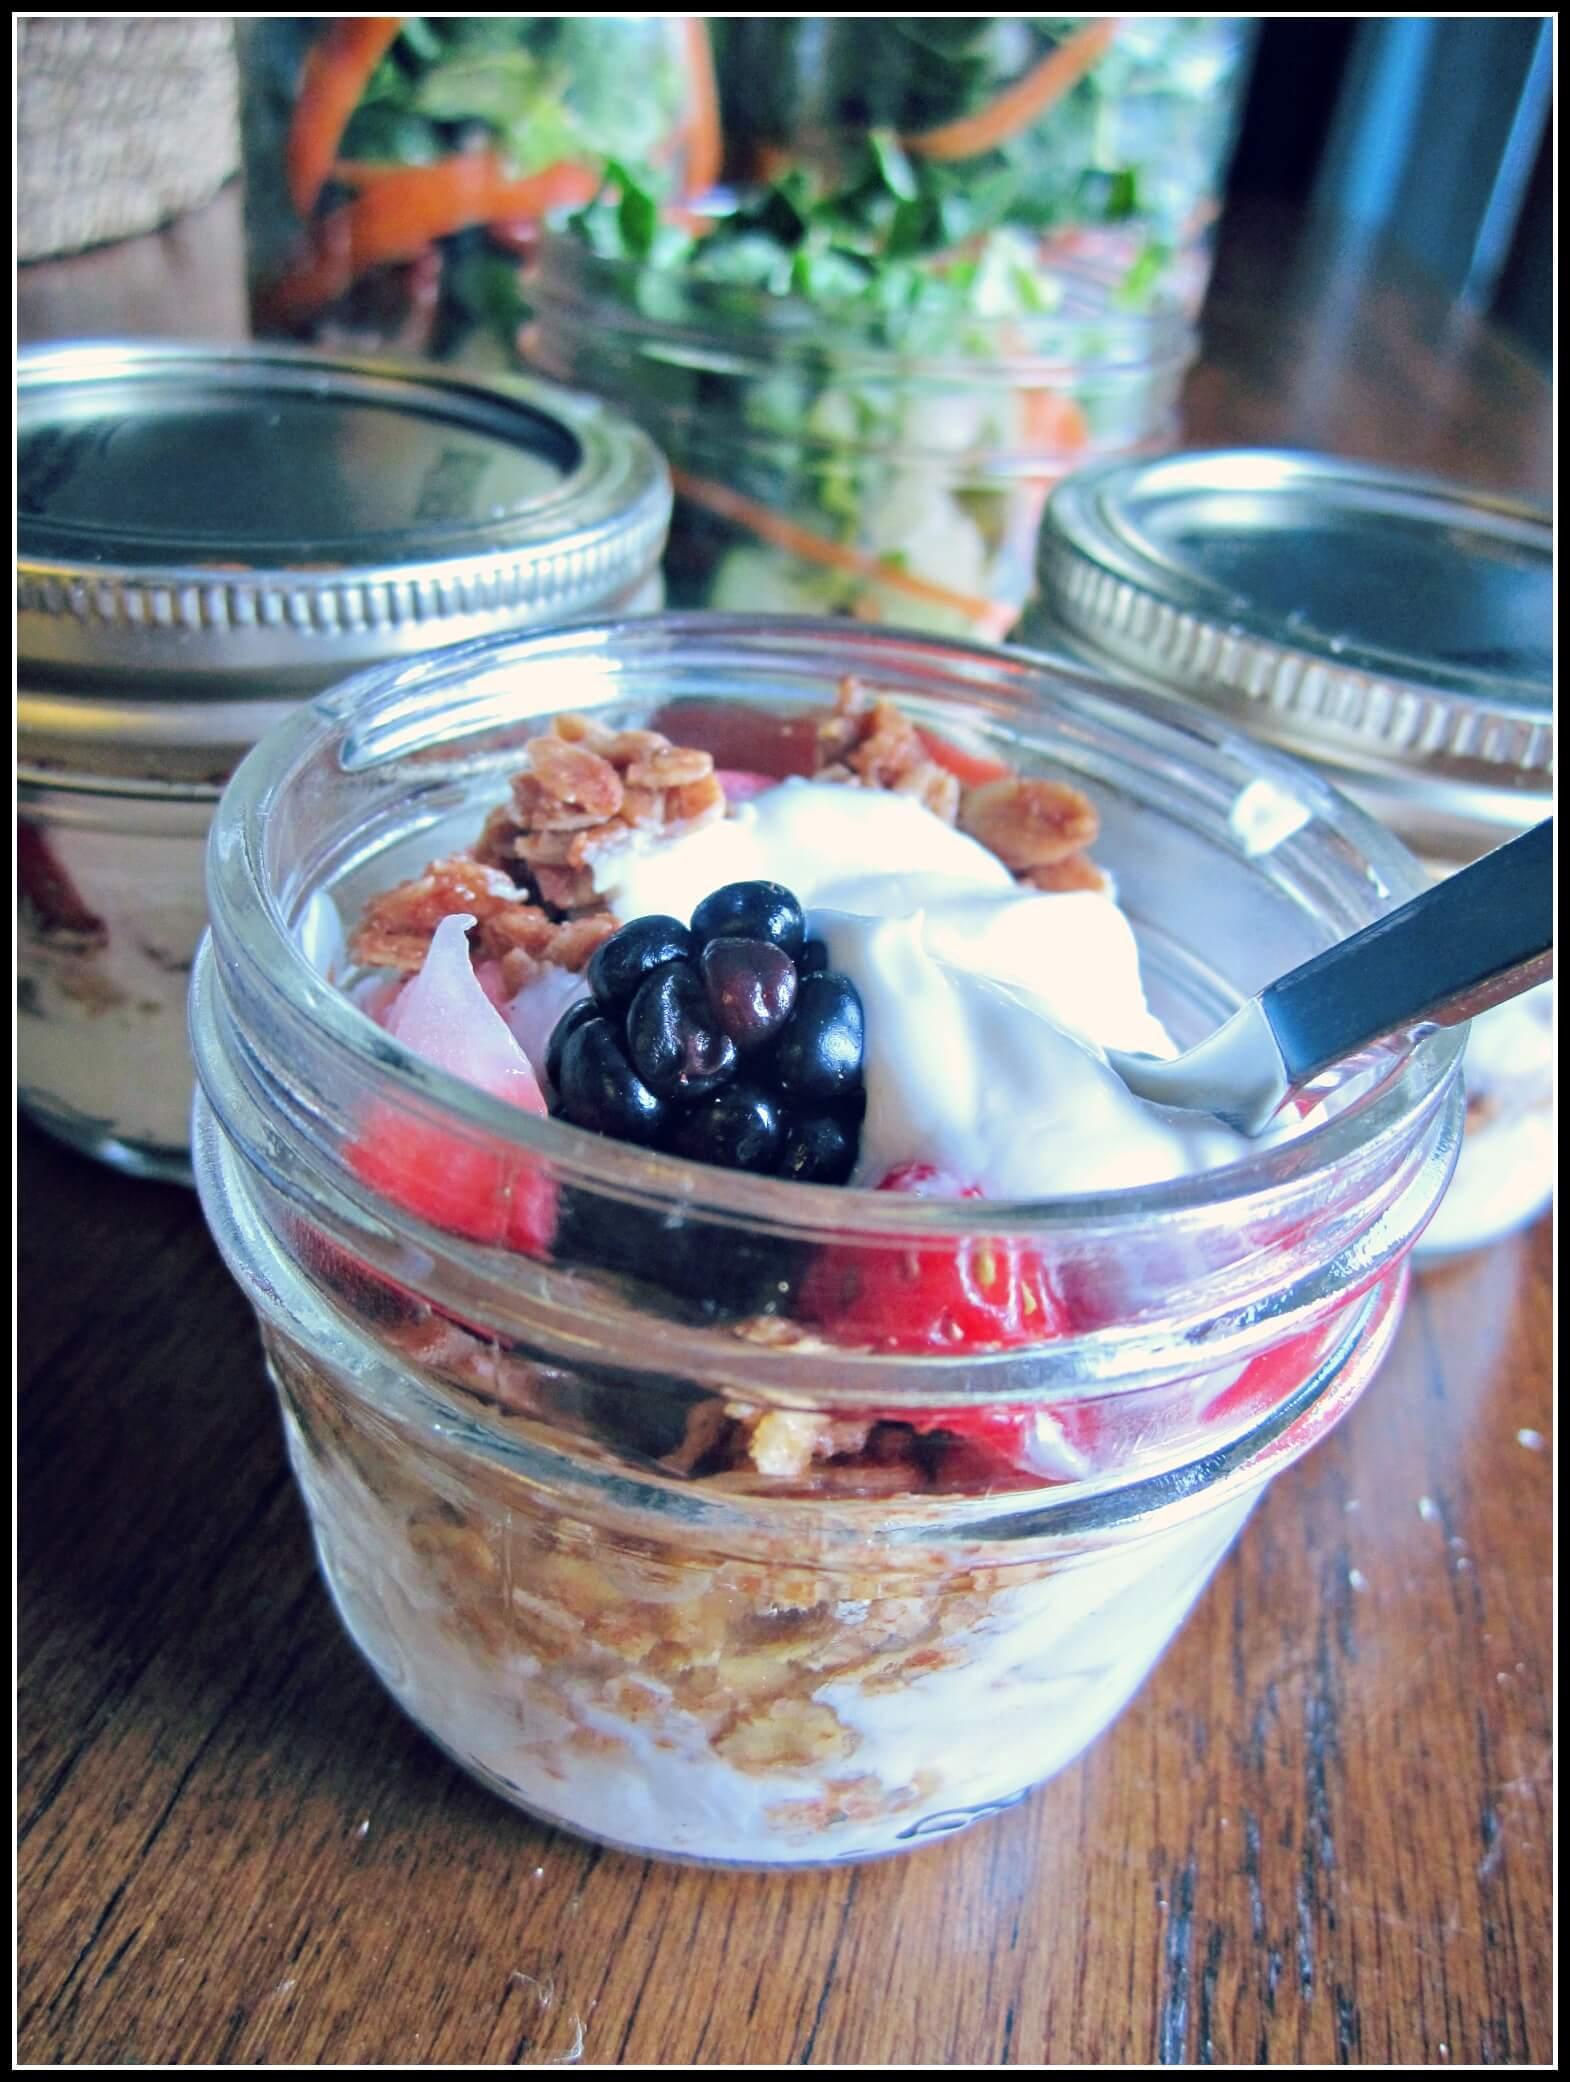 yogurt and fruit in a jar